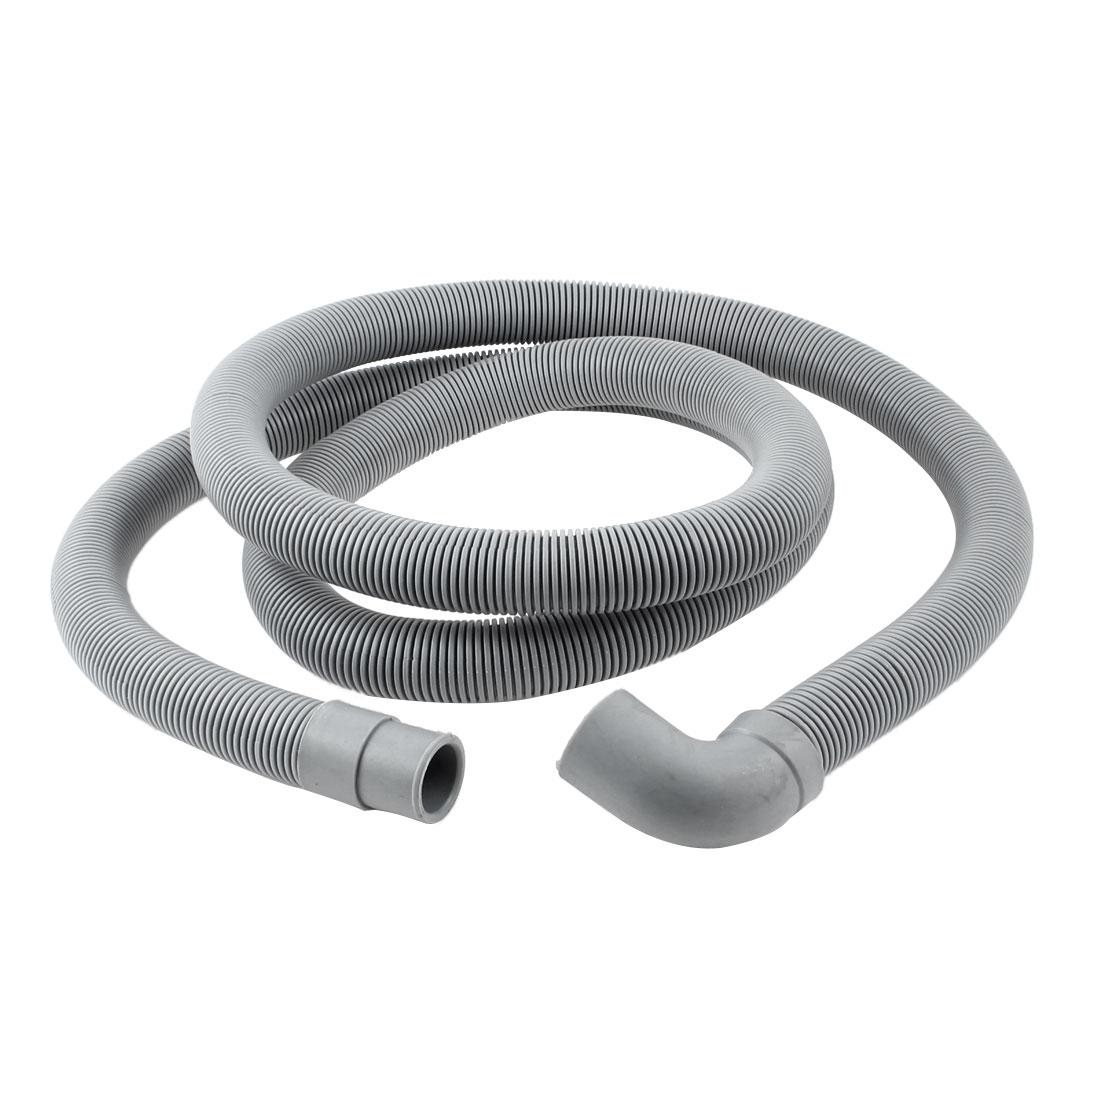 "78.7"" Long Plastic Gray Washing Machine Drain Pipe Washer Hose"